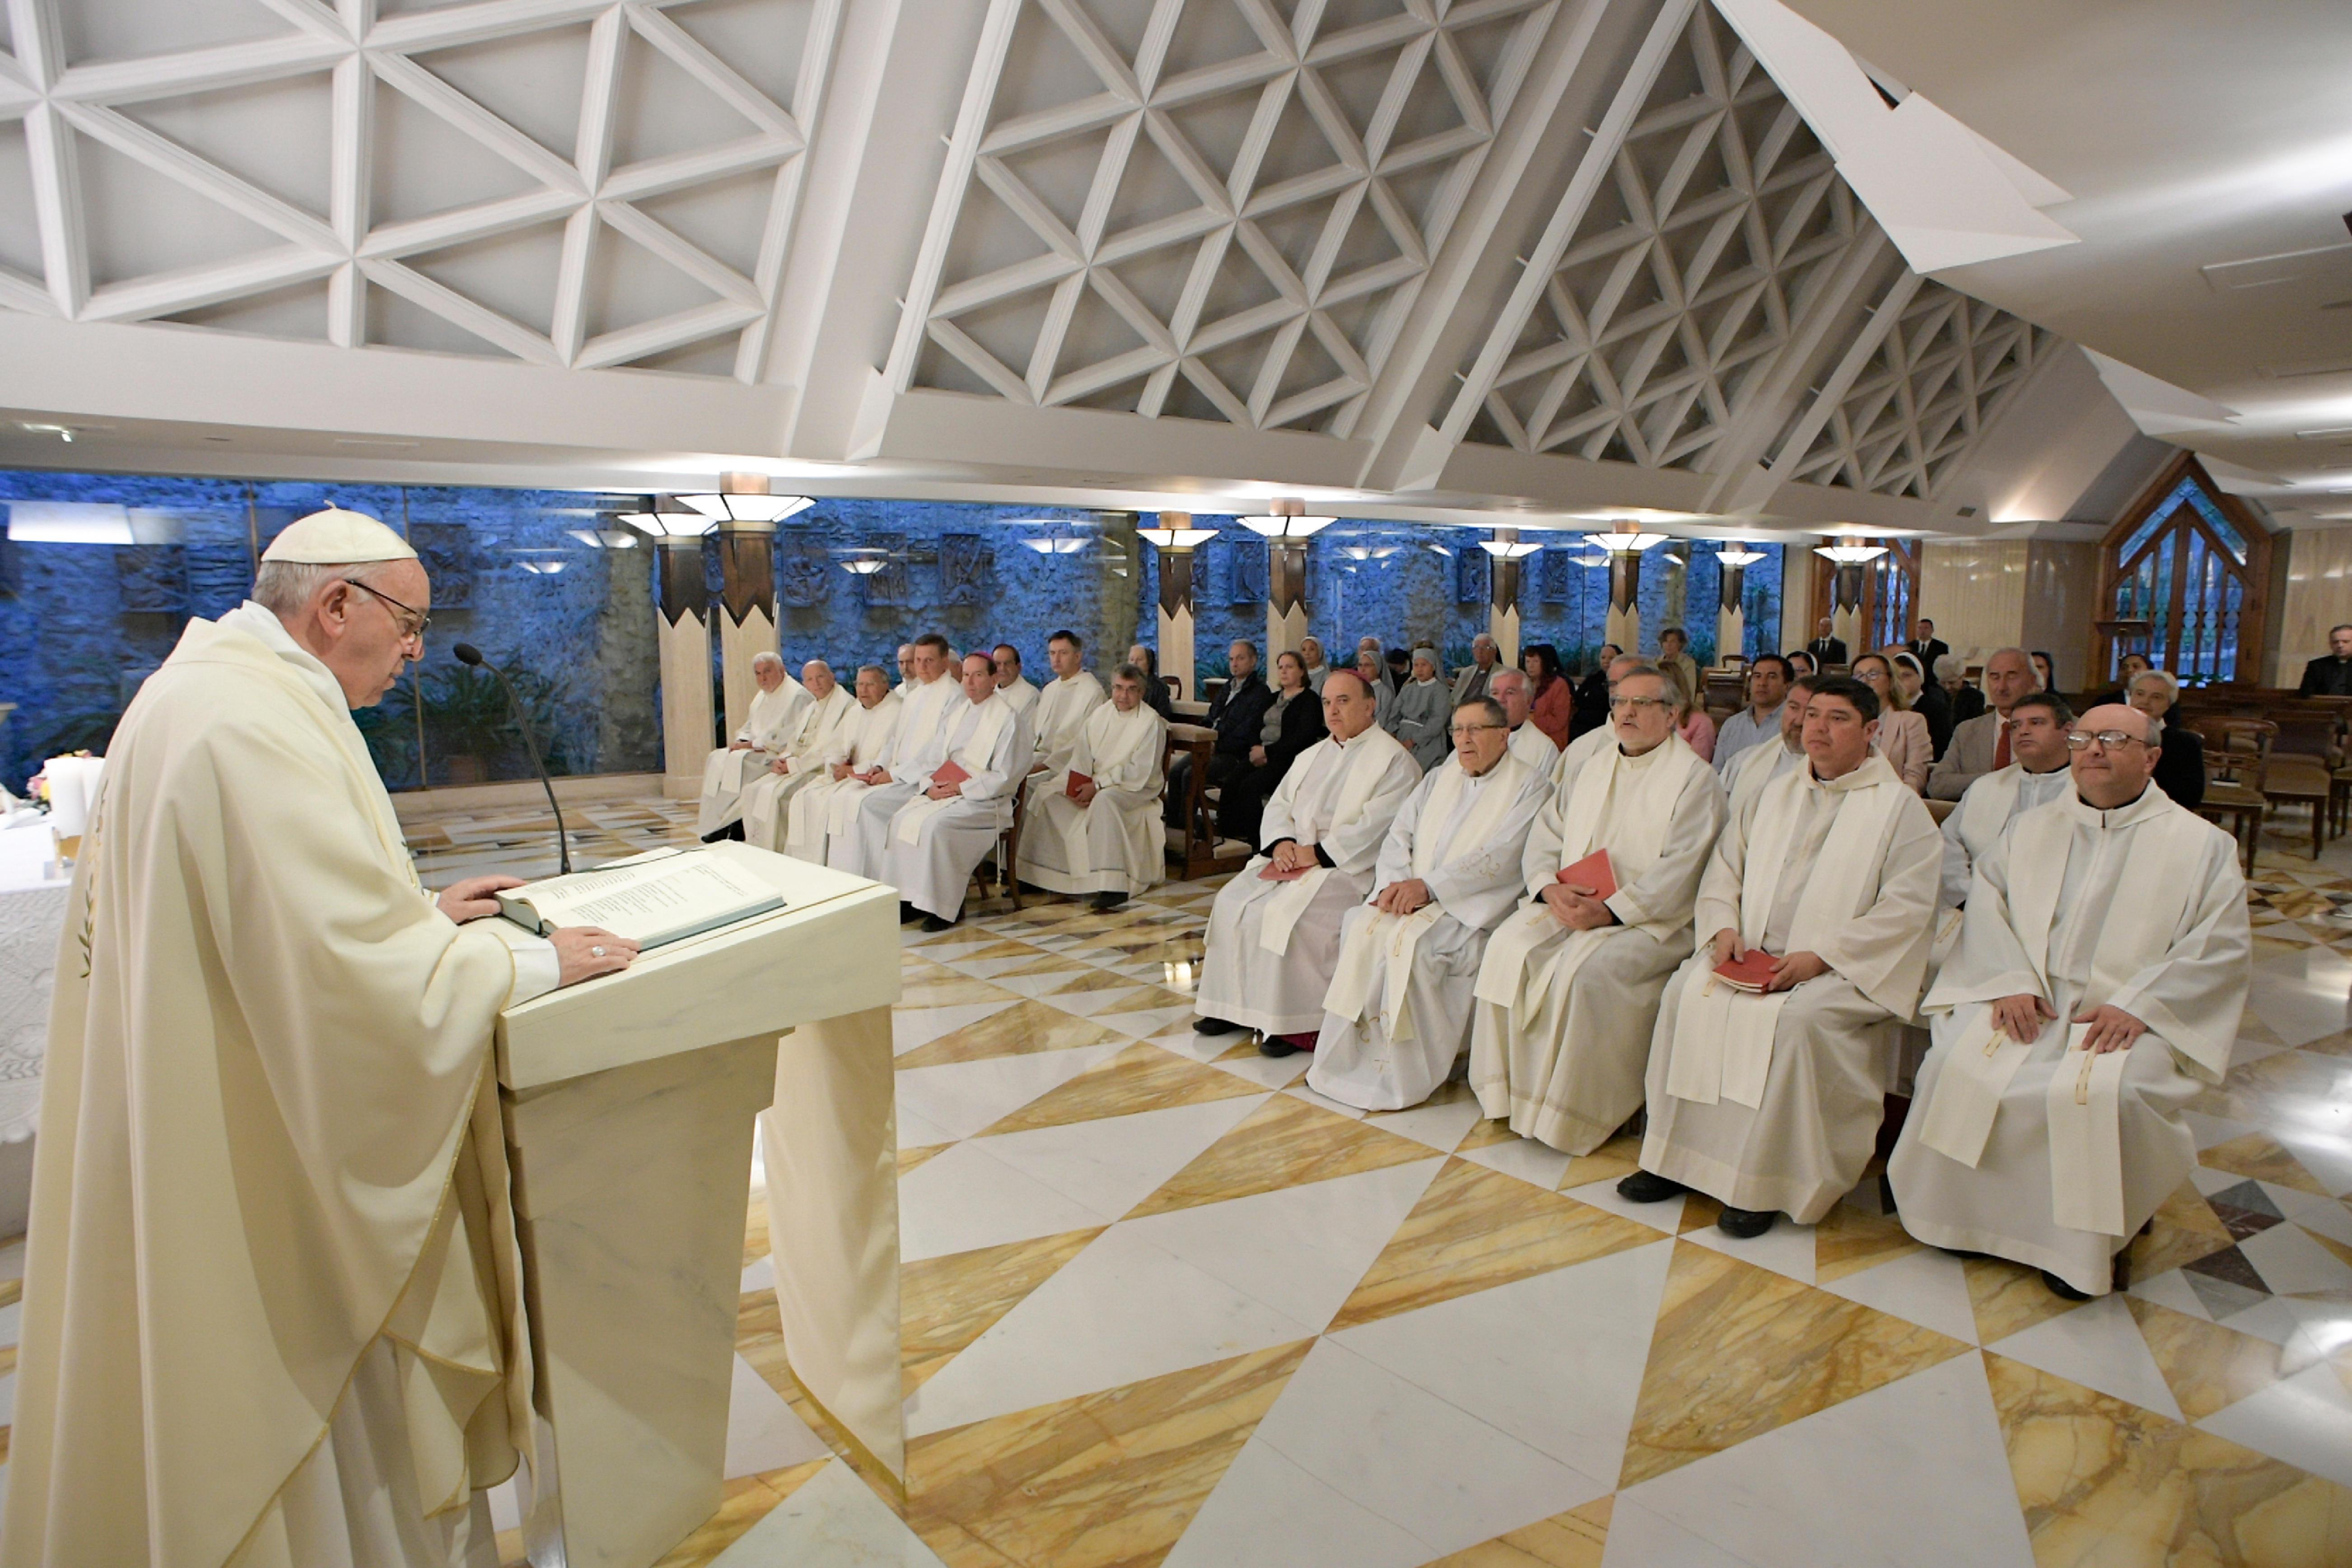 Messe du 25/09/2017 à Sainte-Marthe © L'Osservatore Romano